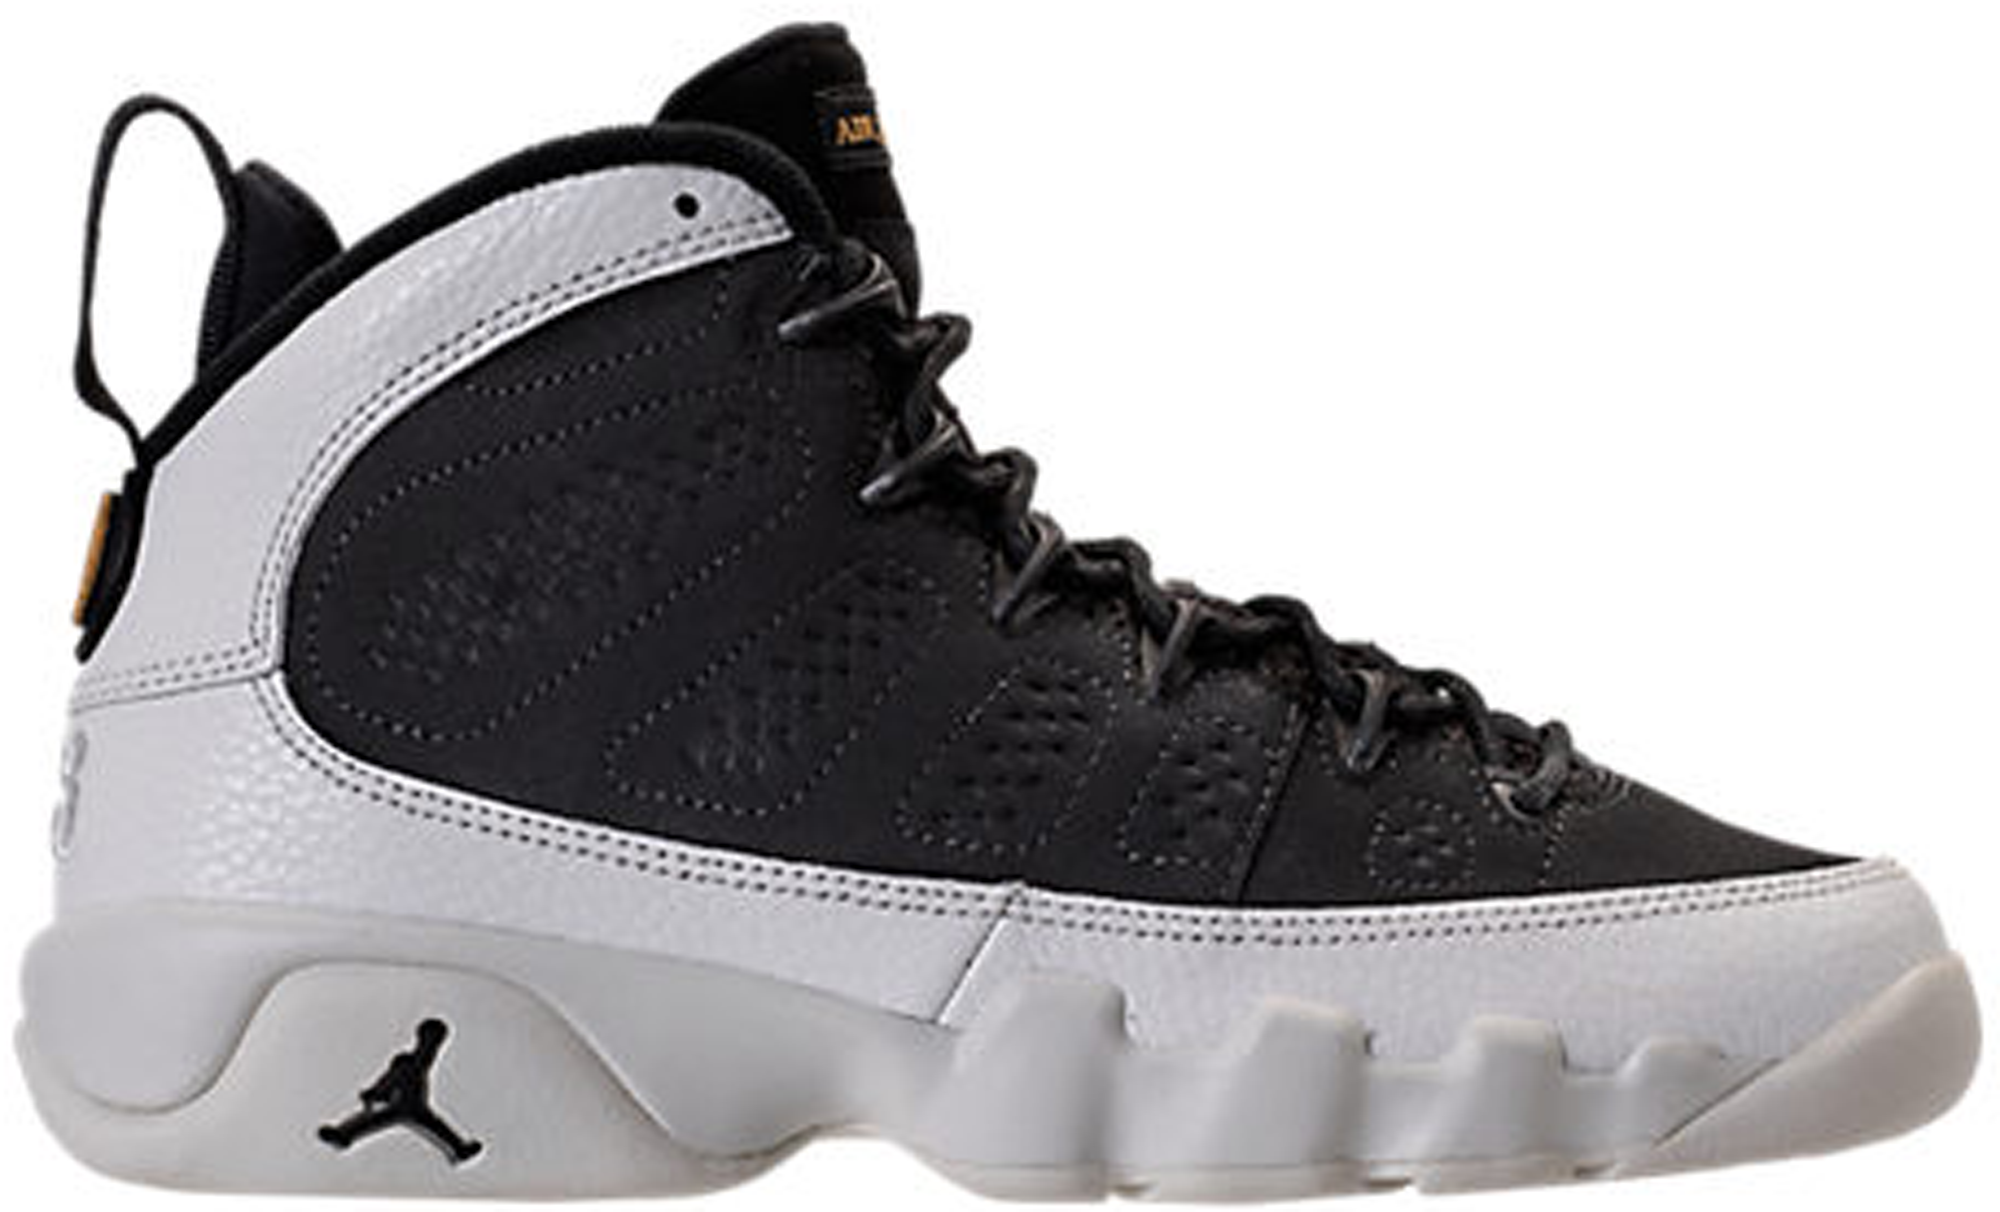 Buy Air Jordan 9 Shoes \u0026 Deadstock Sneakers